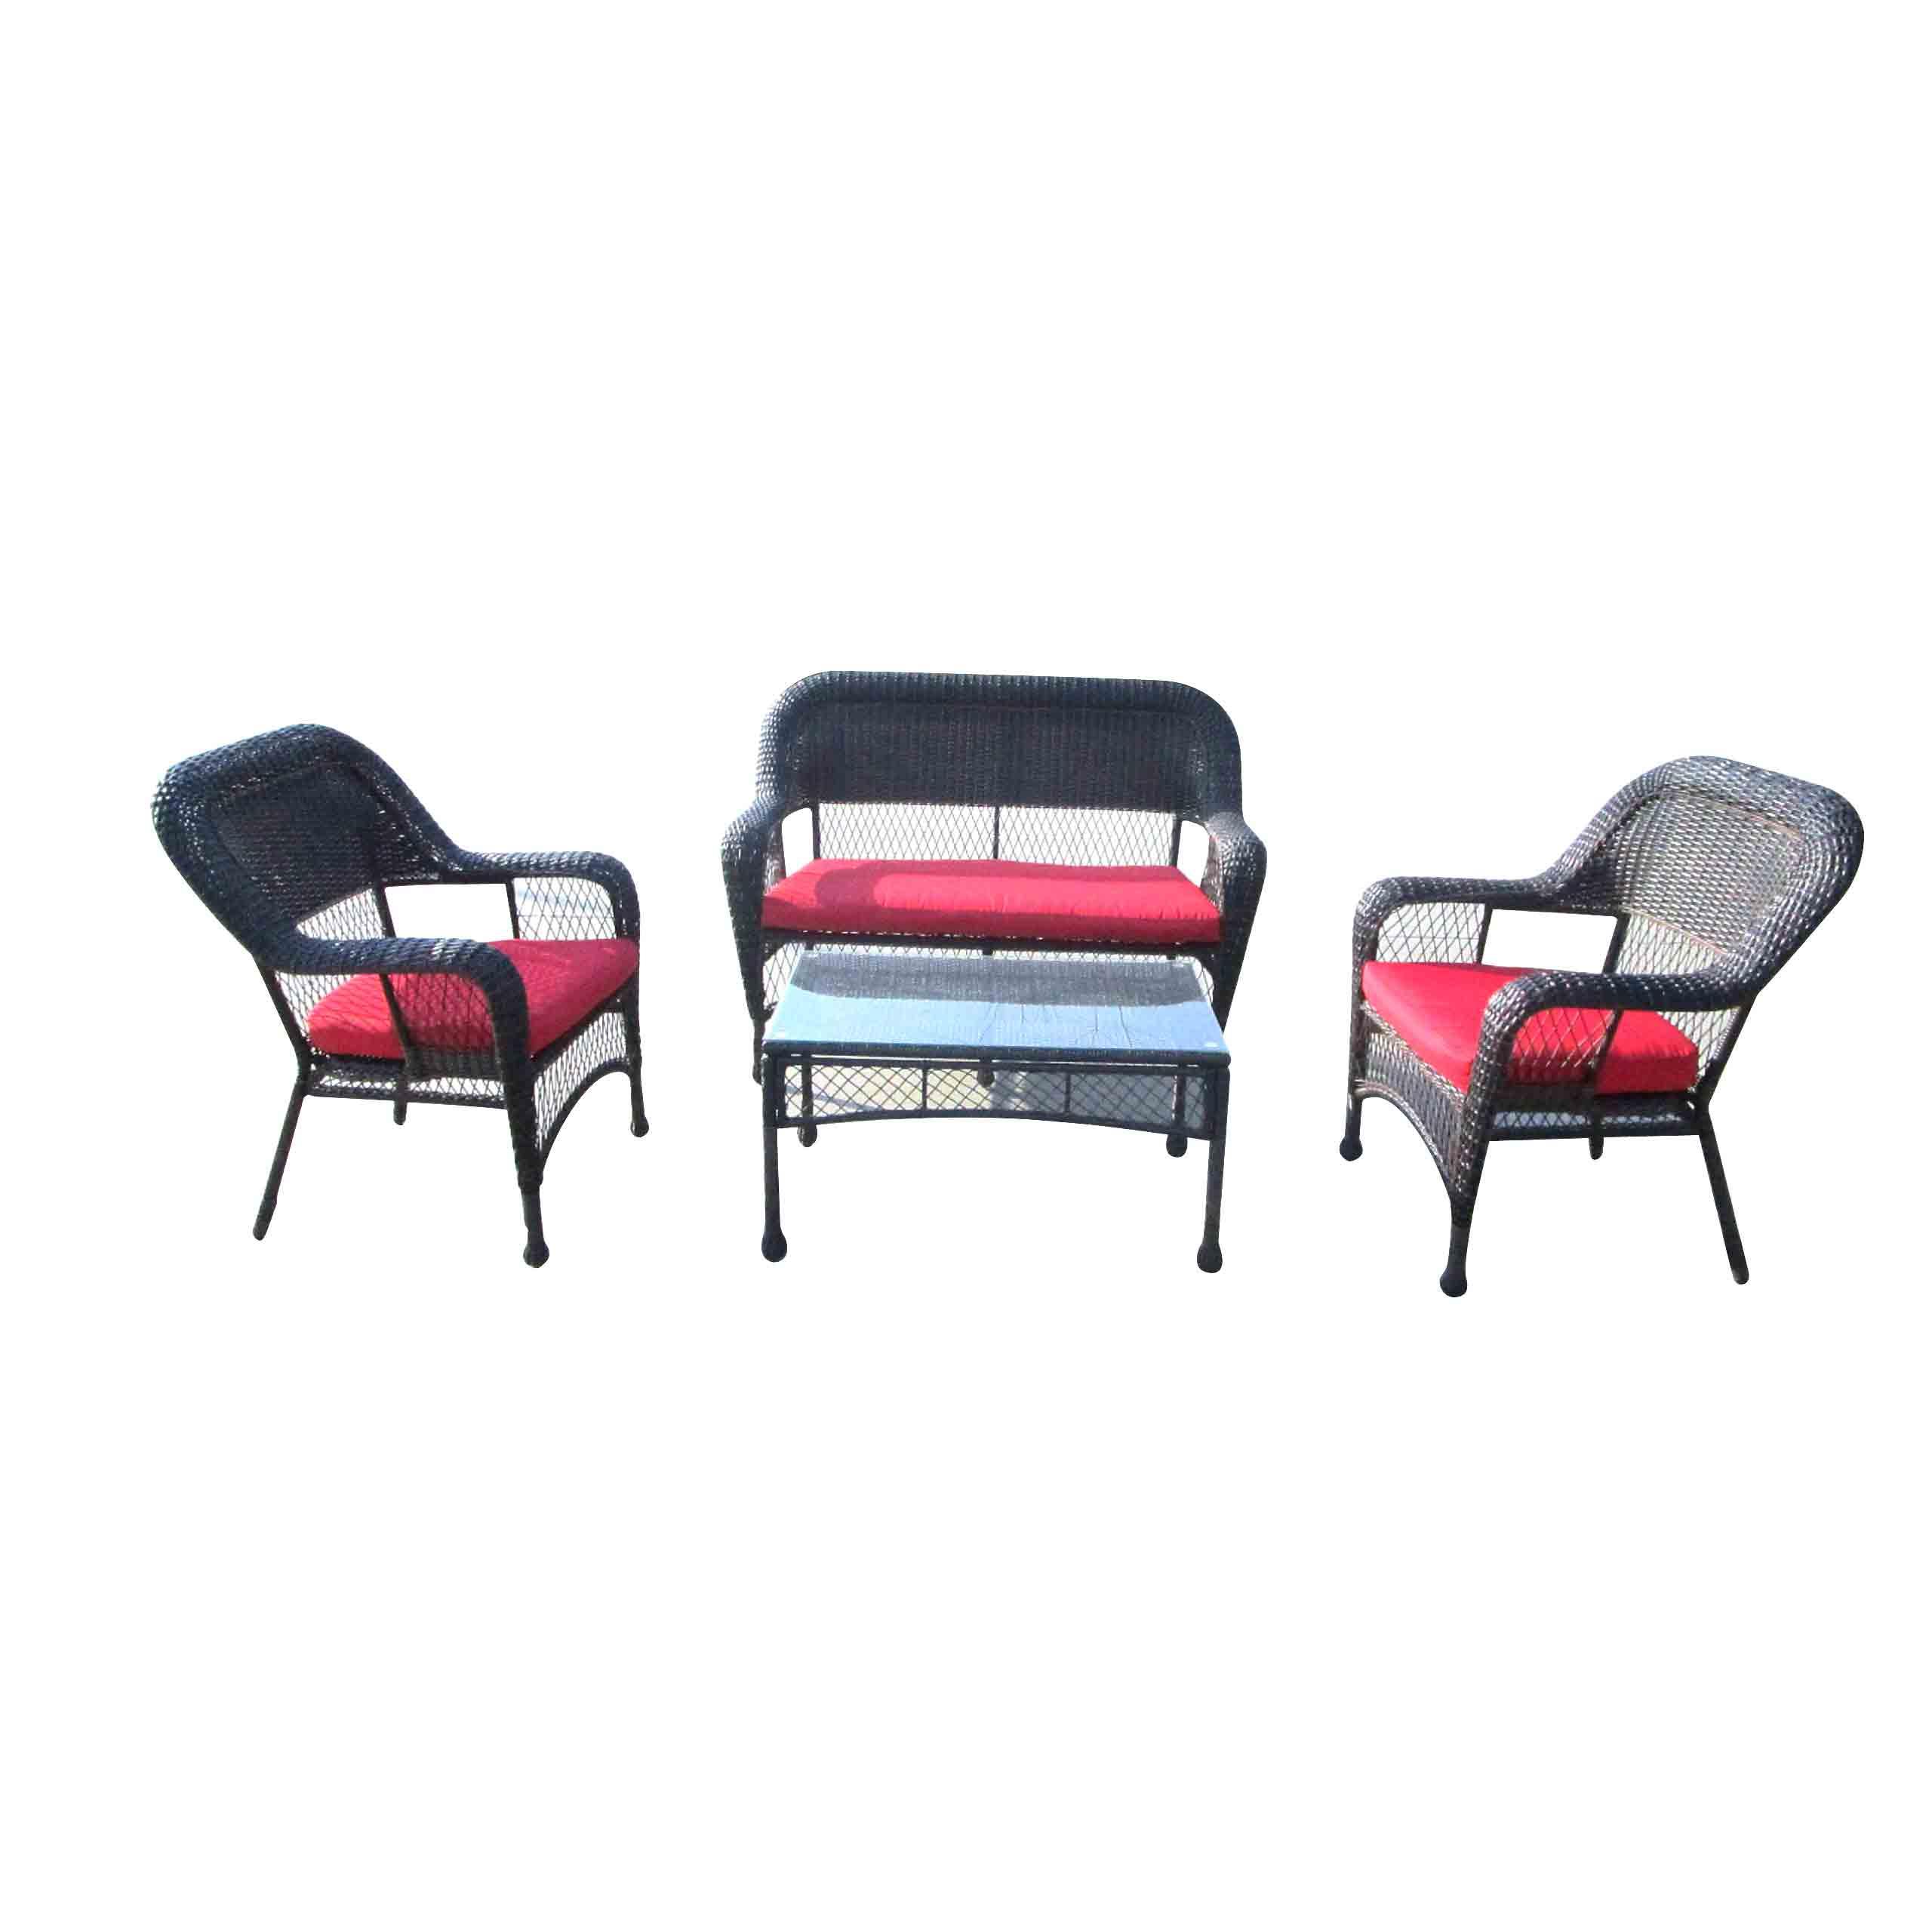 Factory selling Aluminium Folding Chair - JJS181ST Steel frame rattan 4pcs sofa set – Jin-jiang Industry